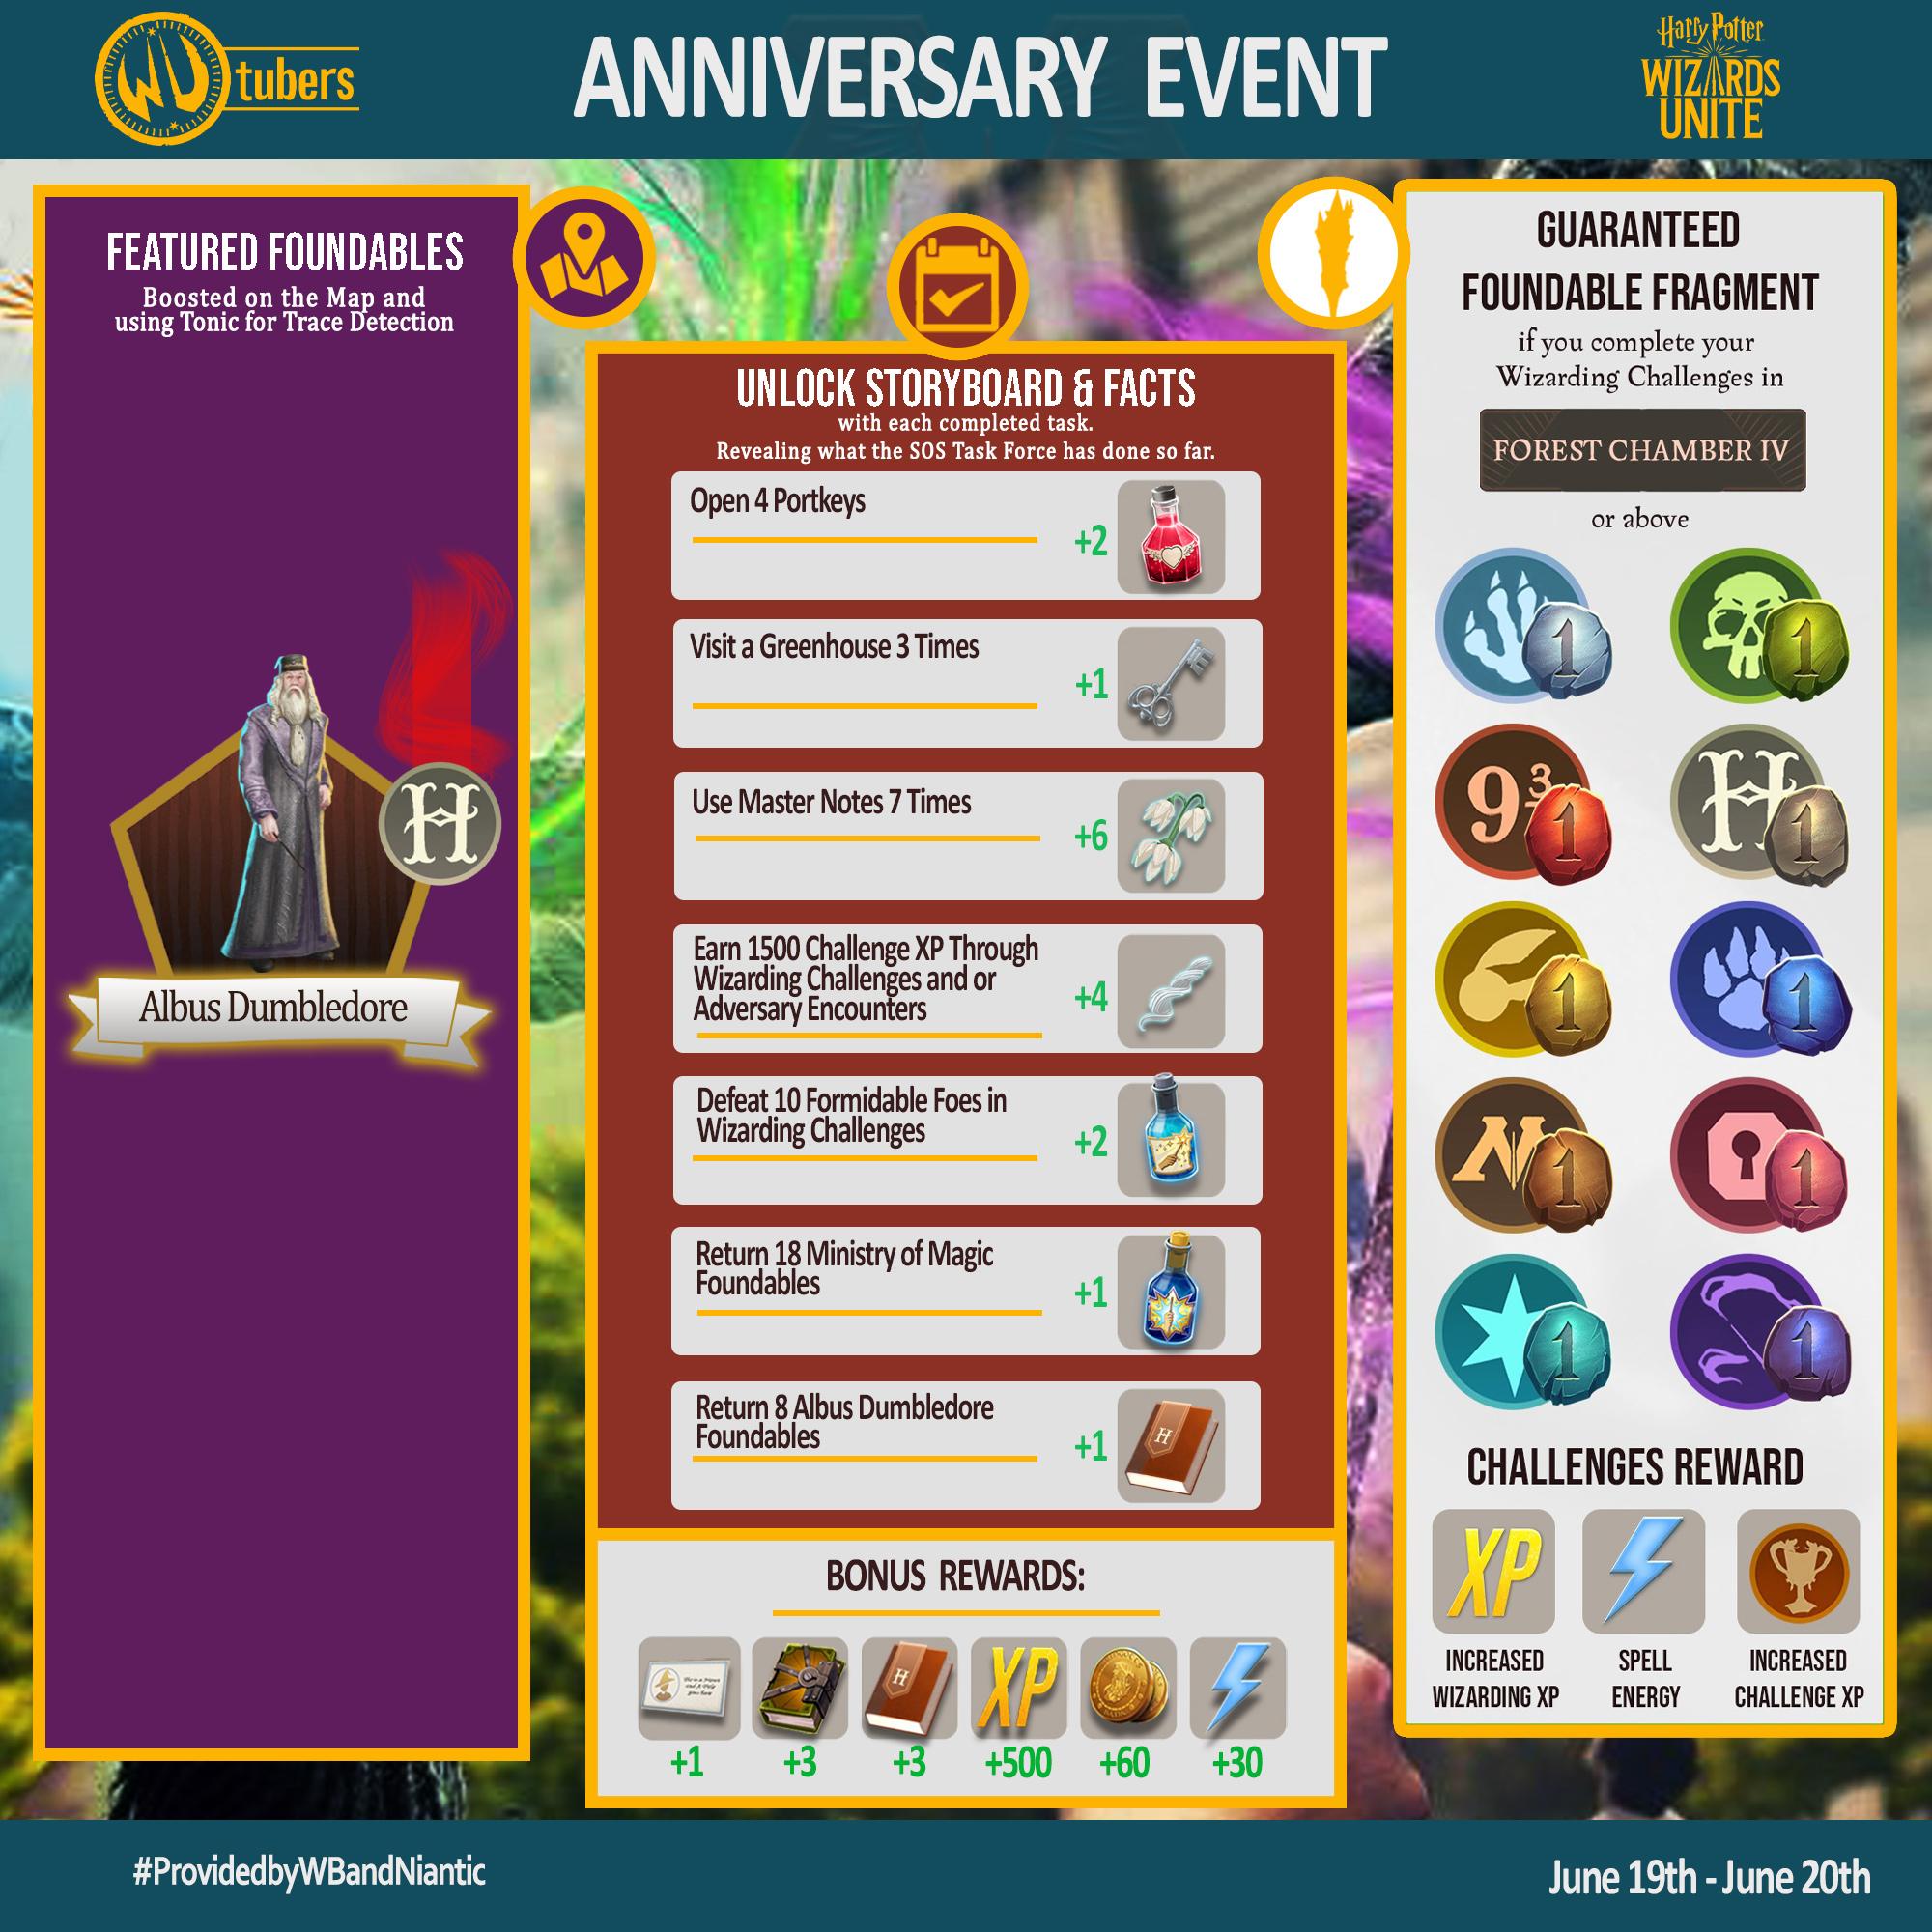 Anniversary_Event_2021_Features__Tasks.jpg